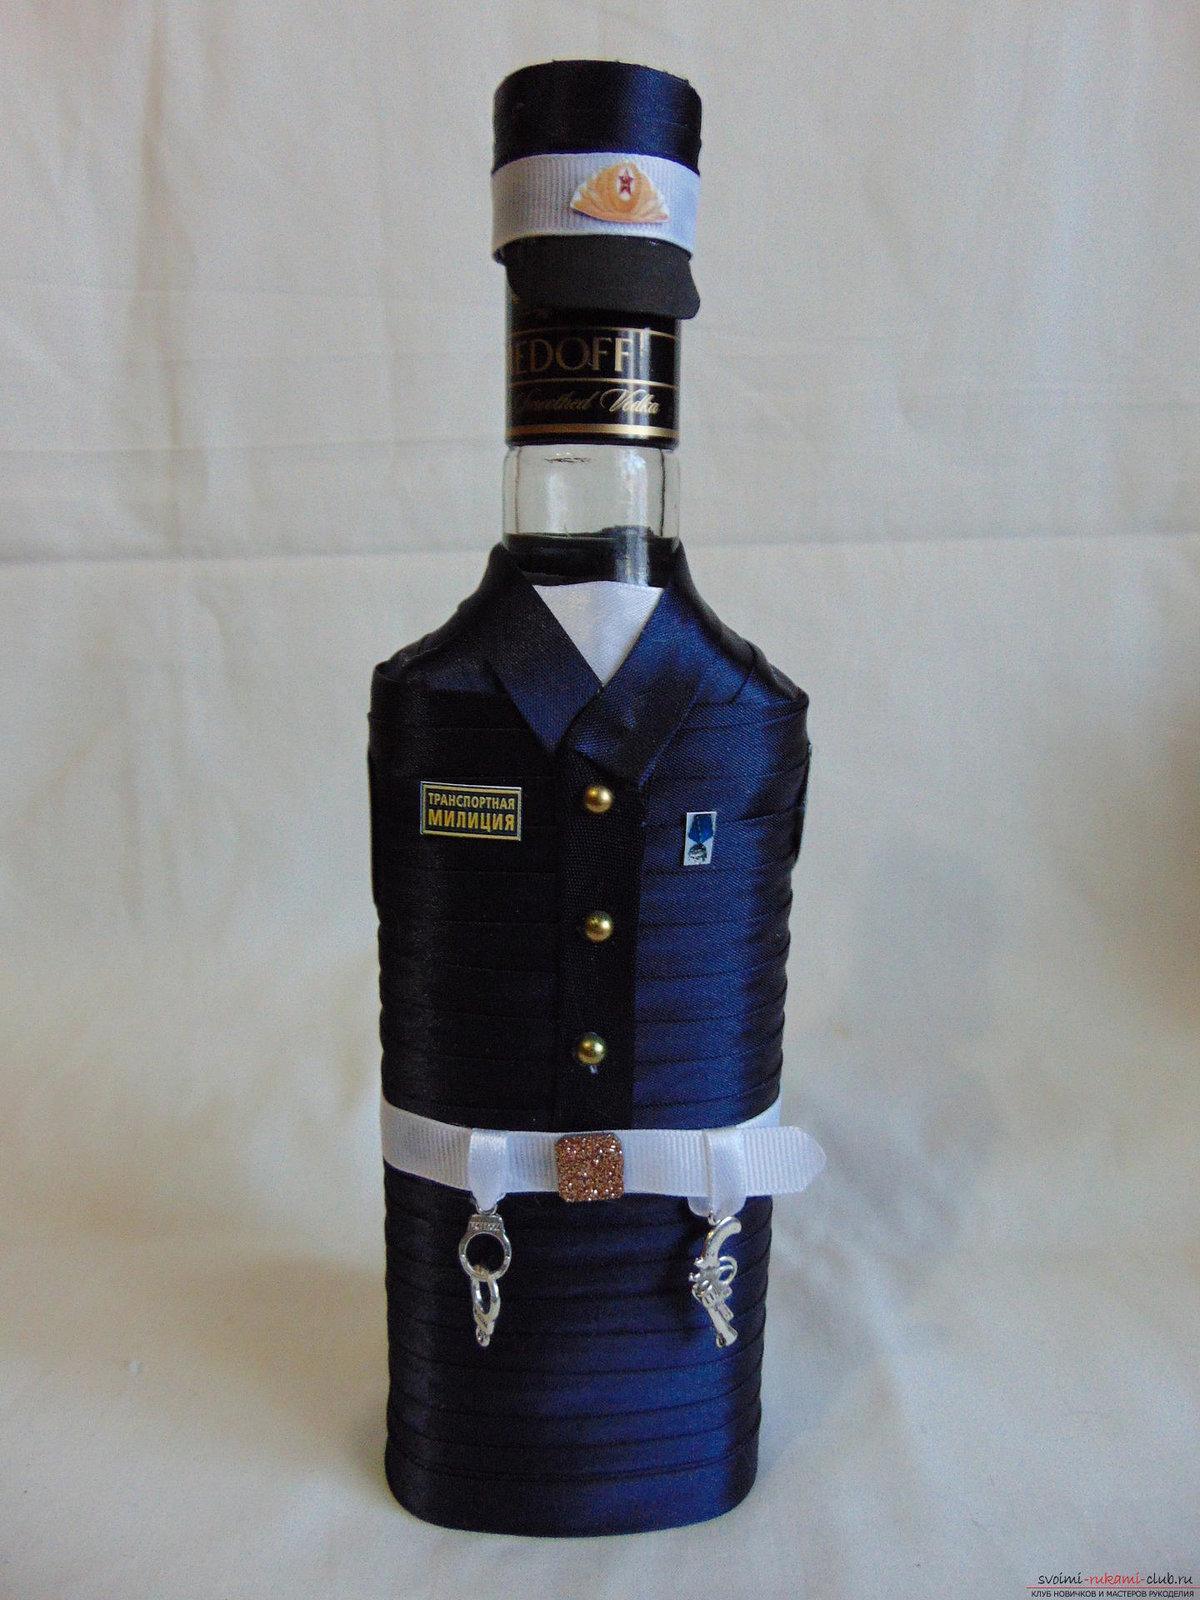 ❶Бутылка лентами на 23 февраля Фоторамки 23 февраля Pin by DIXI on Wine Bottle Cover   Pinterest   Bottle Crafts, Wine Bottle Crafts and Bottle HarperCollins Publishers }